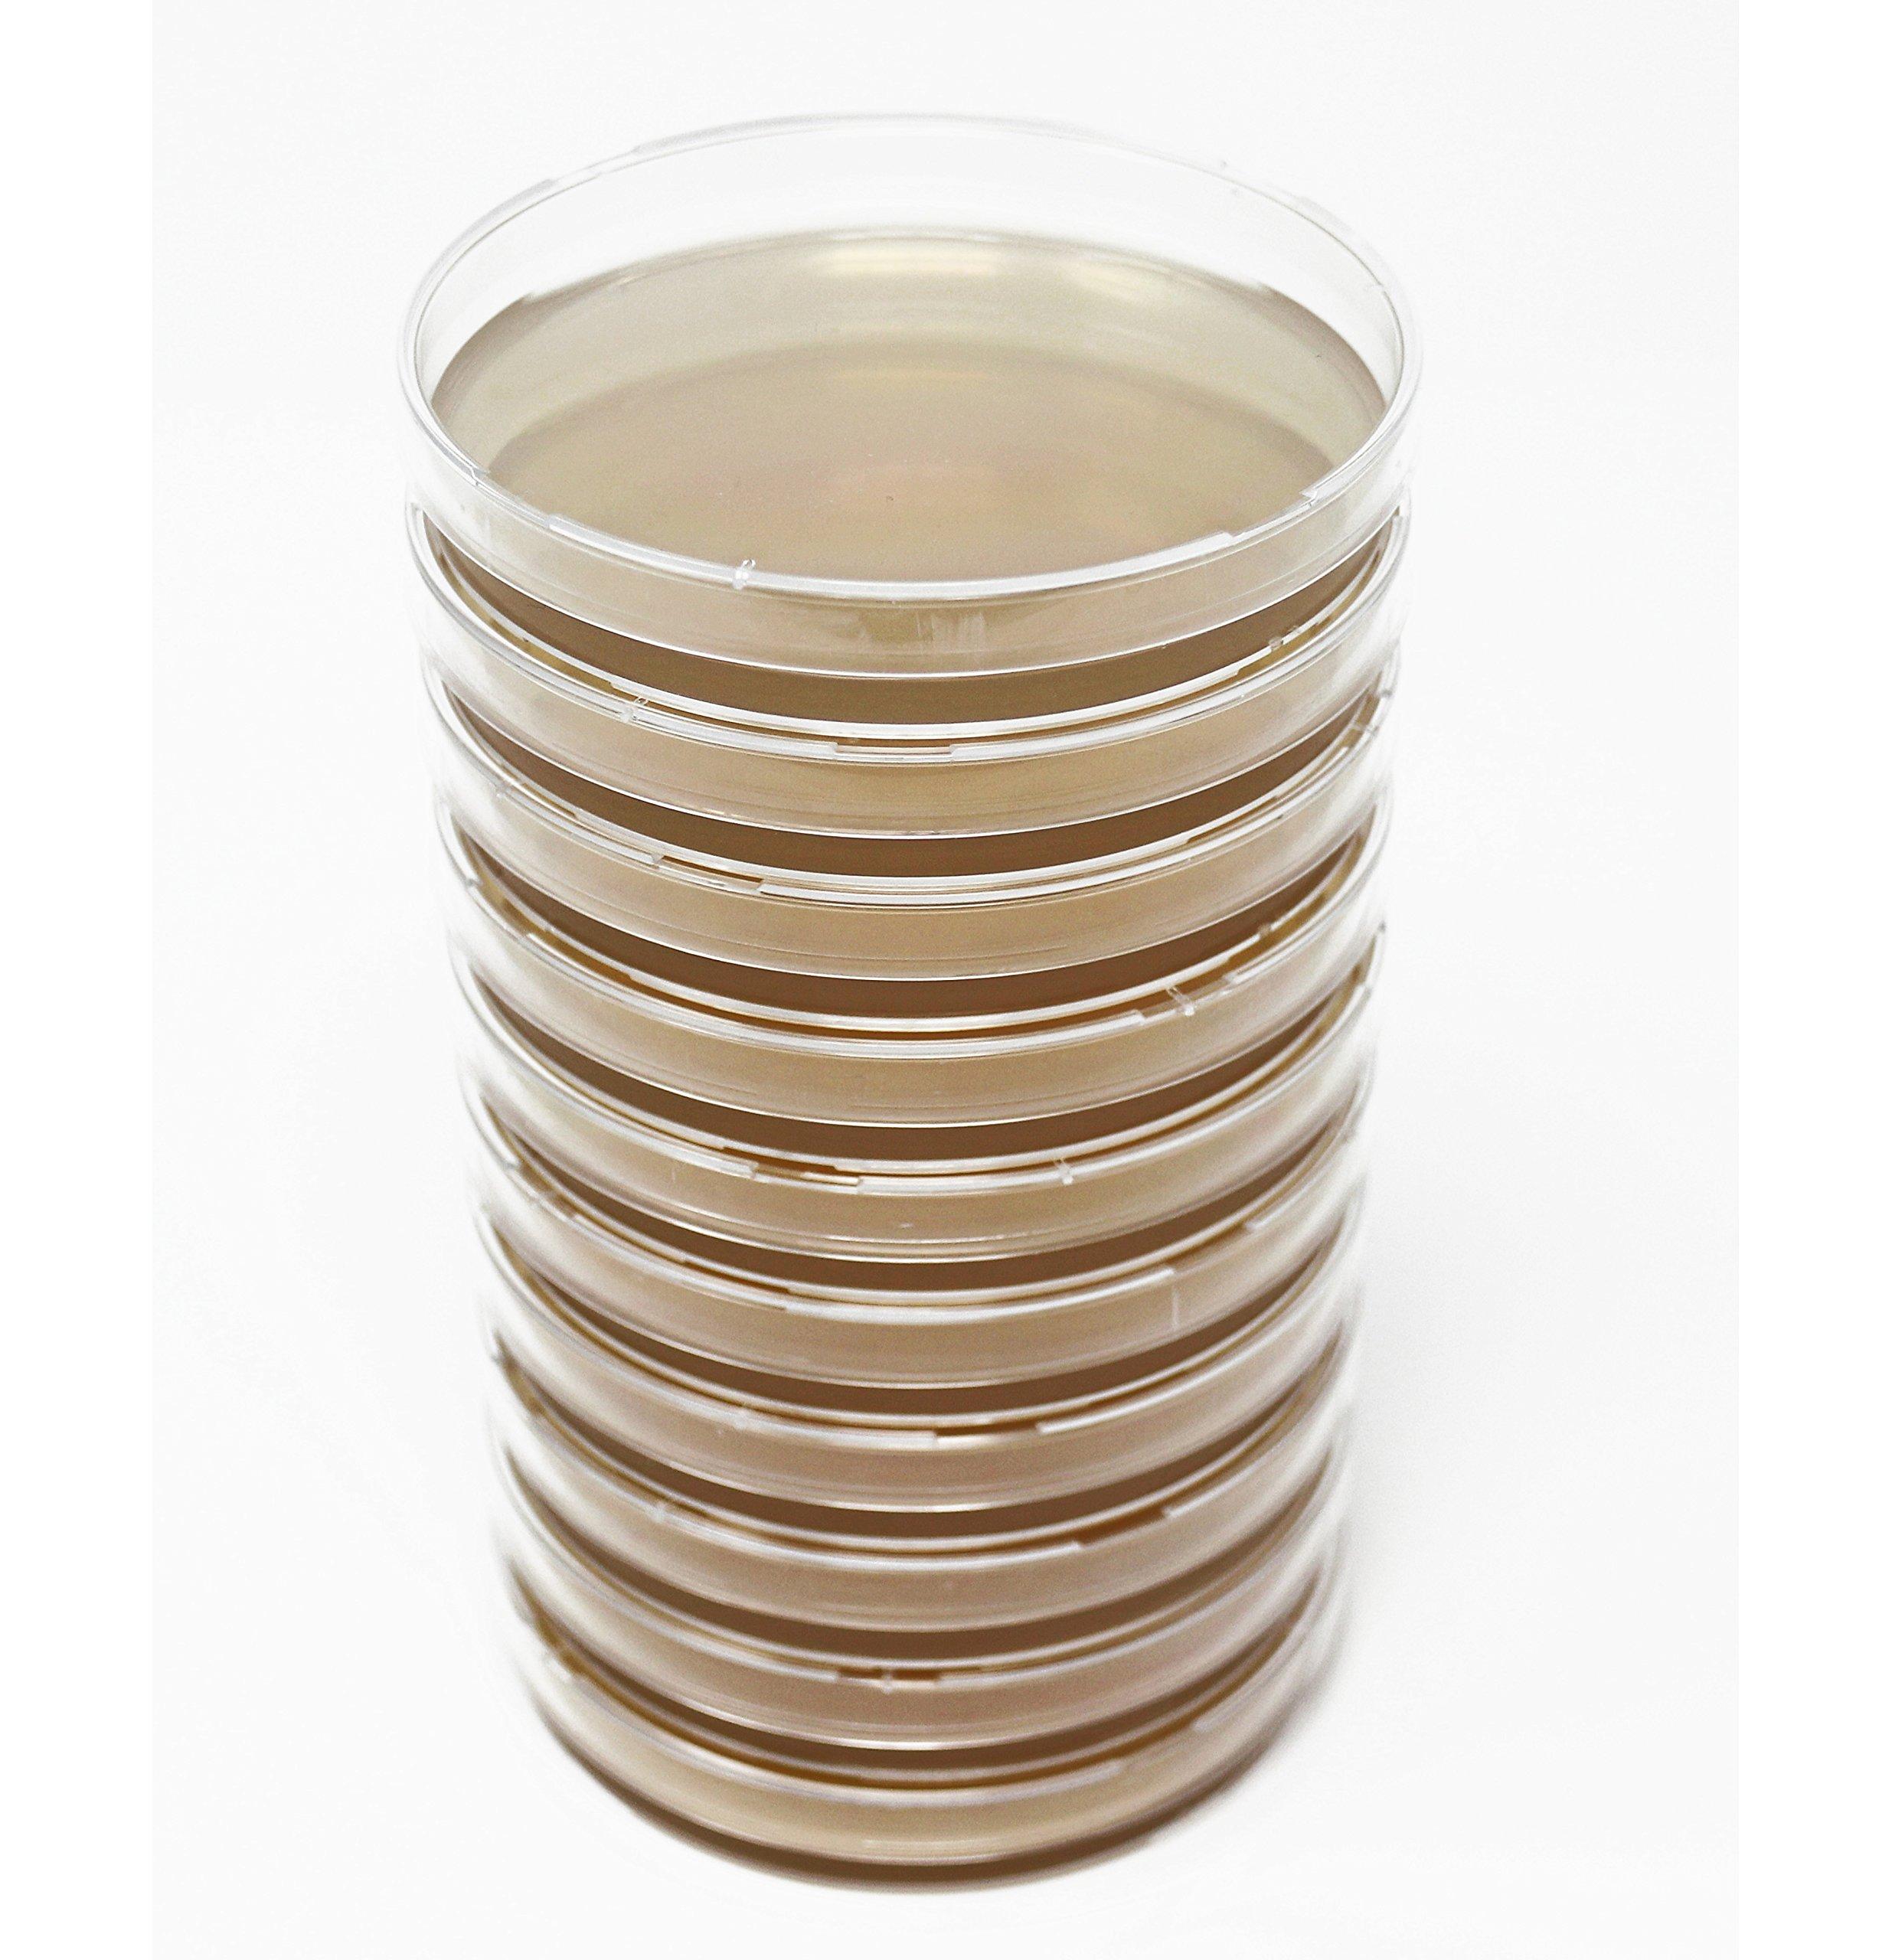 EZ BioResearch Malt Extract Agar (MEA) Plates for Mushroom Cultivation (10 Prepoured Agar Plates)